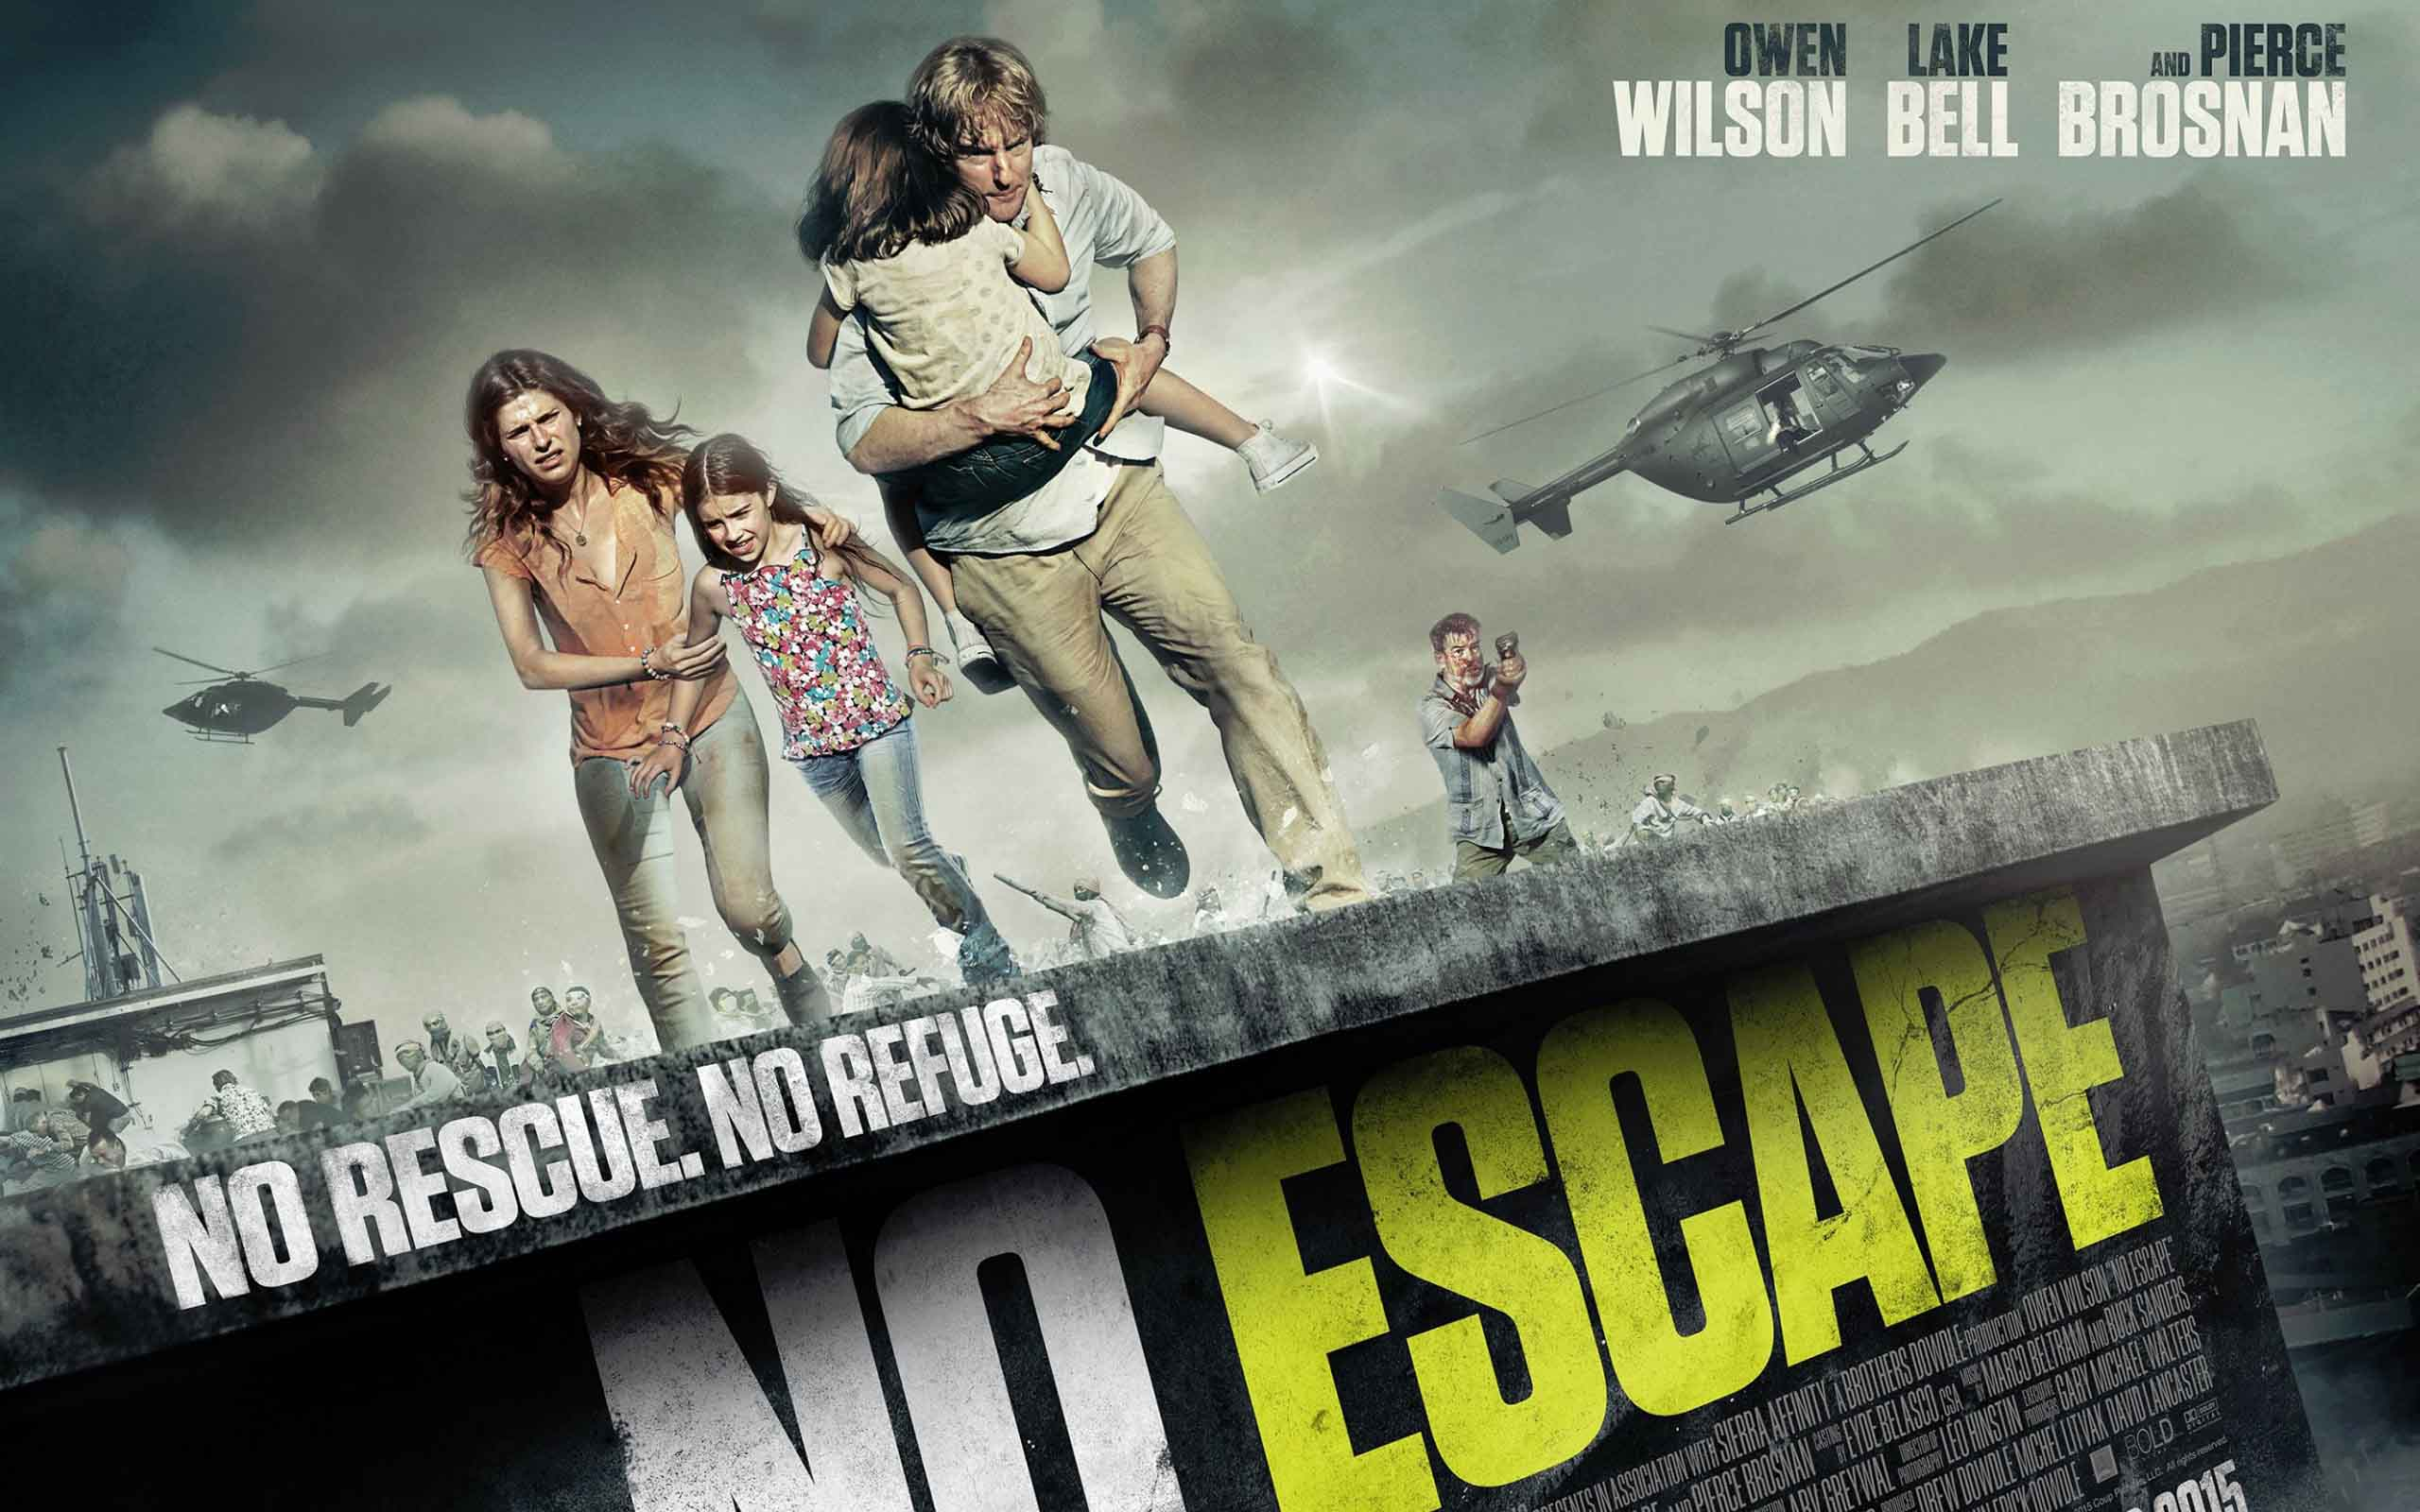 No Escape 2015 Movie Poster Wallpaper - DreamLoveWallpapers